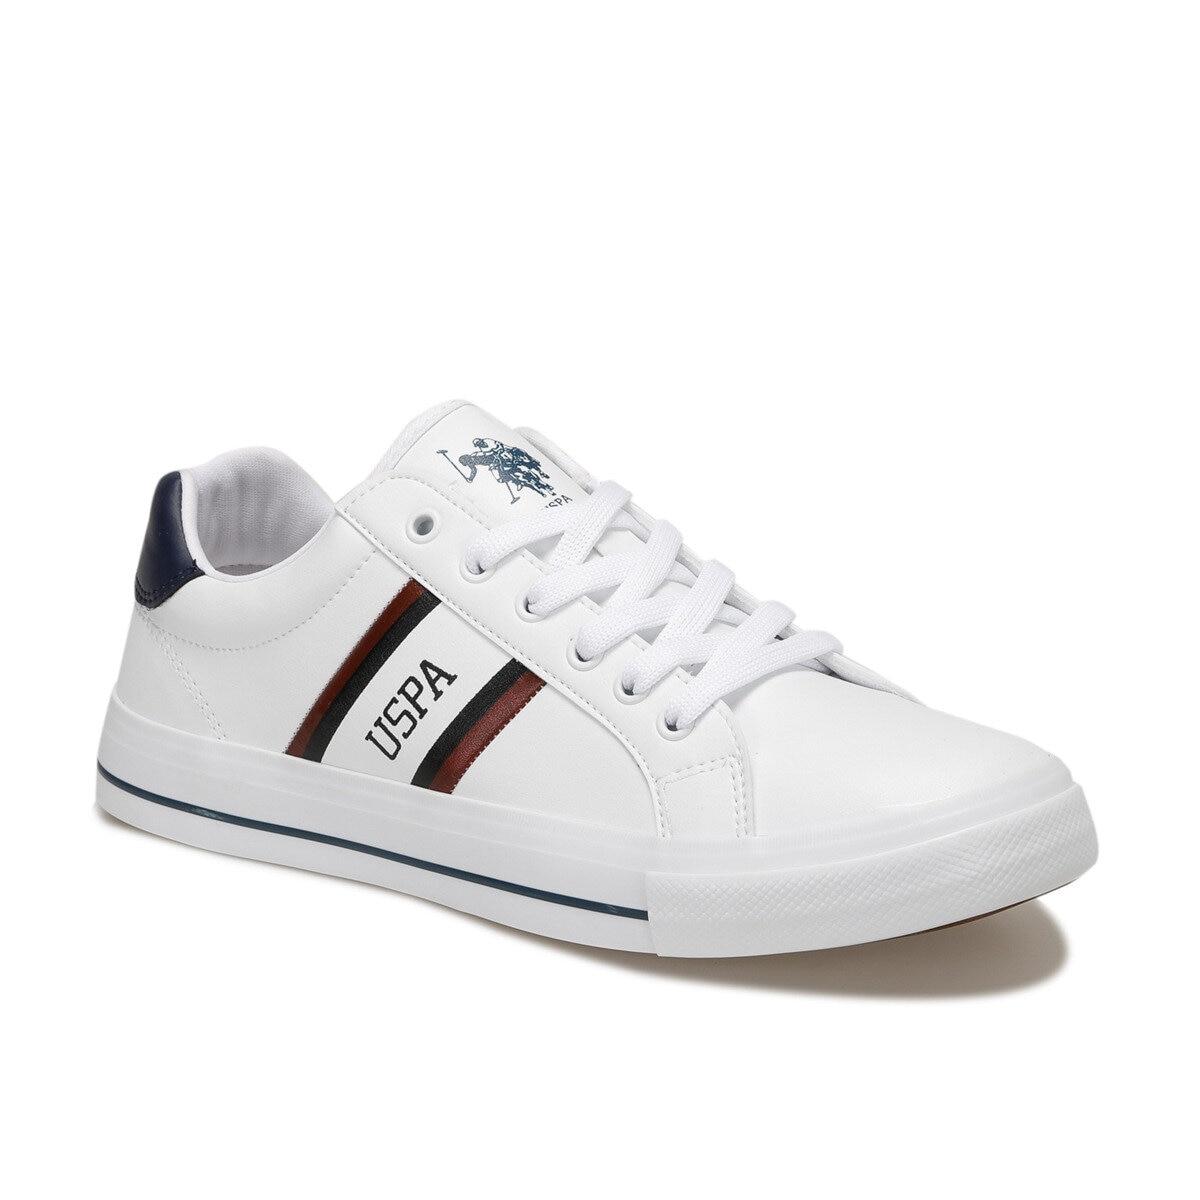 FLO White Men's Sneaker 2020 Men Casual Shoes Fashion New Sneakers Men Shoes Comfort Sneakers Men's Shoes Trainers U.S. POLO ASSN. PURE